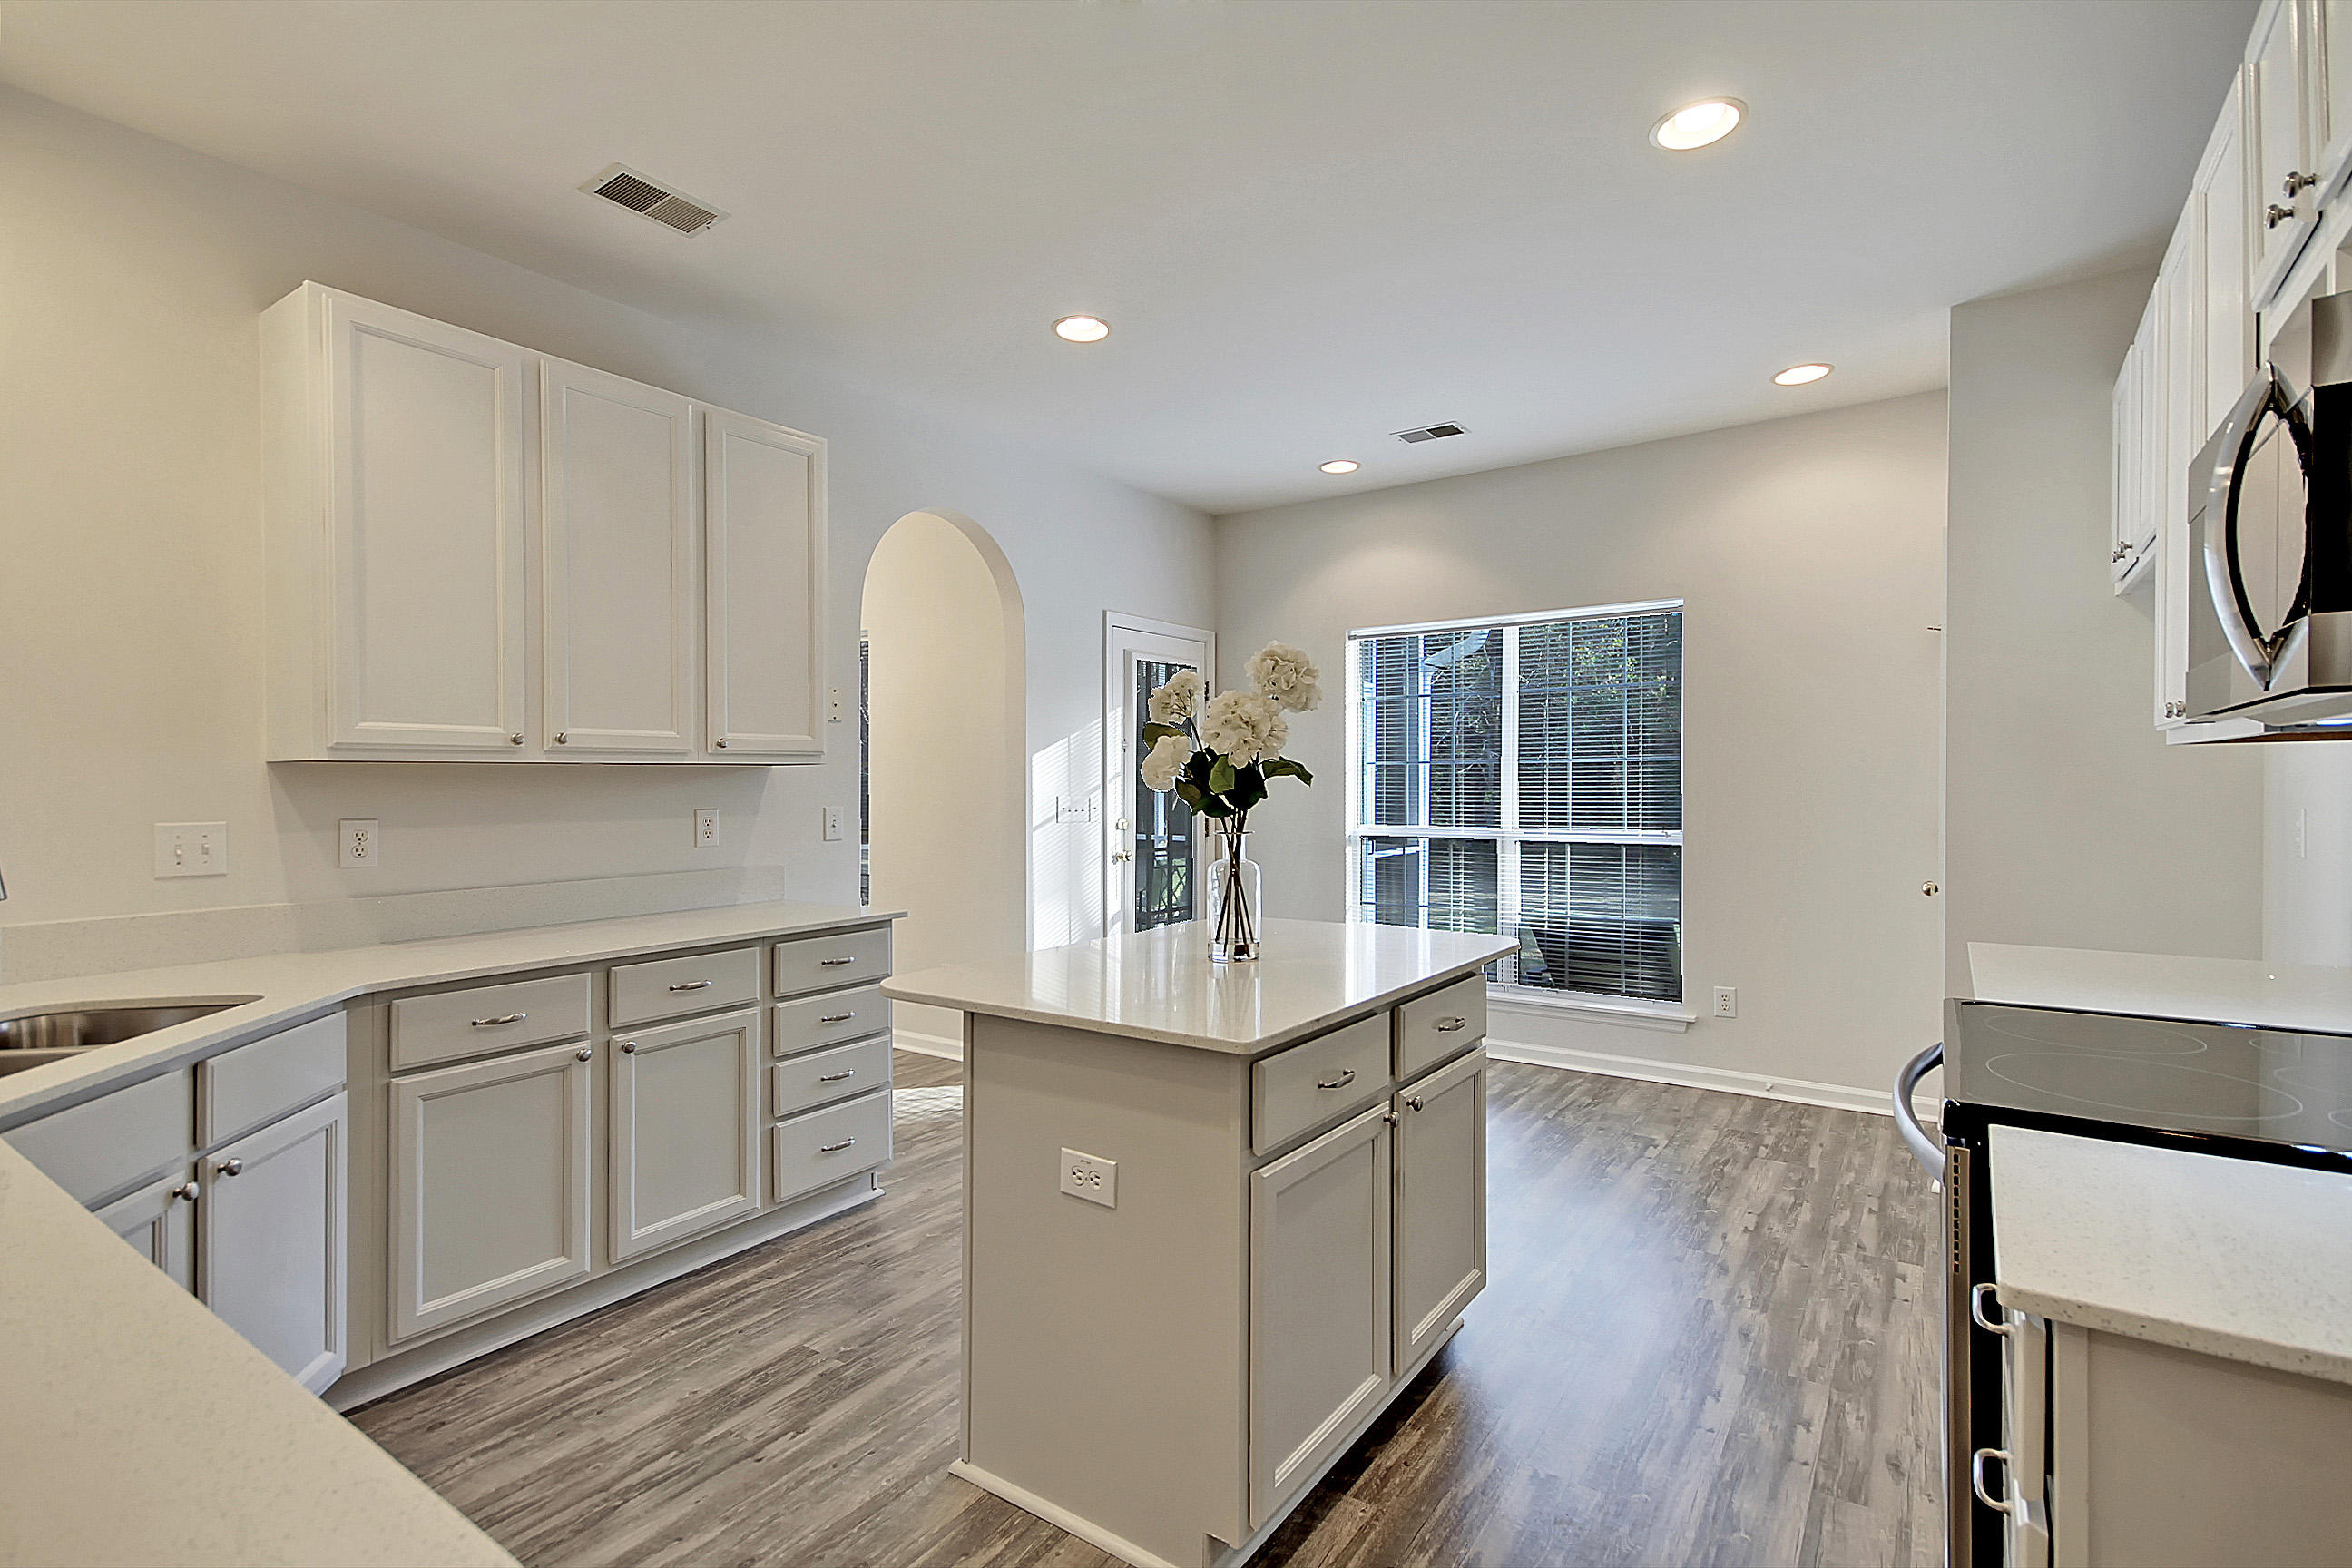 Dunes West Homes For Sale - 2656 Palmetto Hall, Mount Pleasant, SC - 2